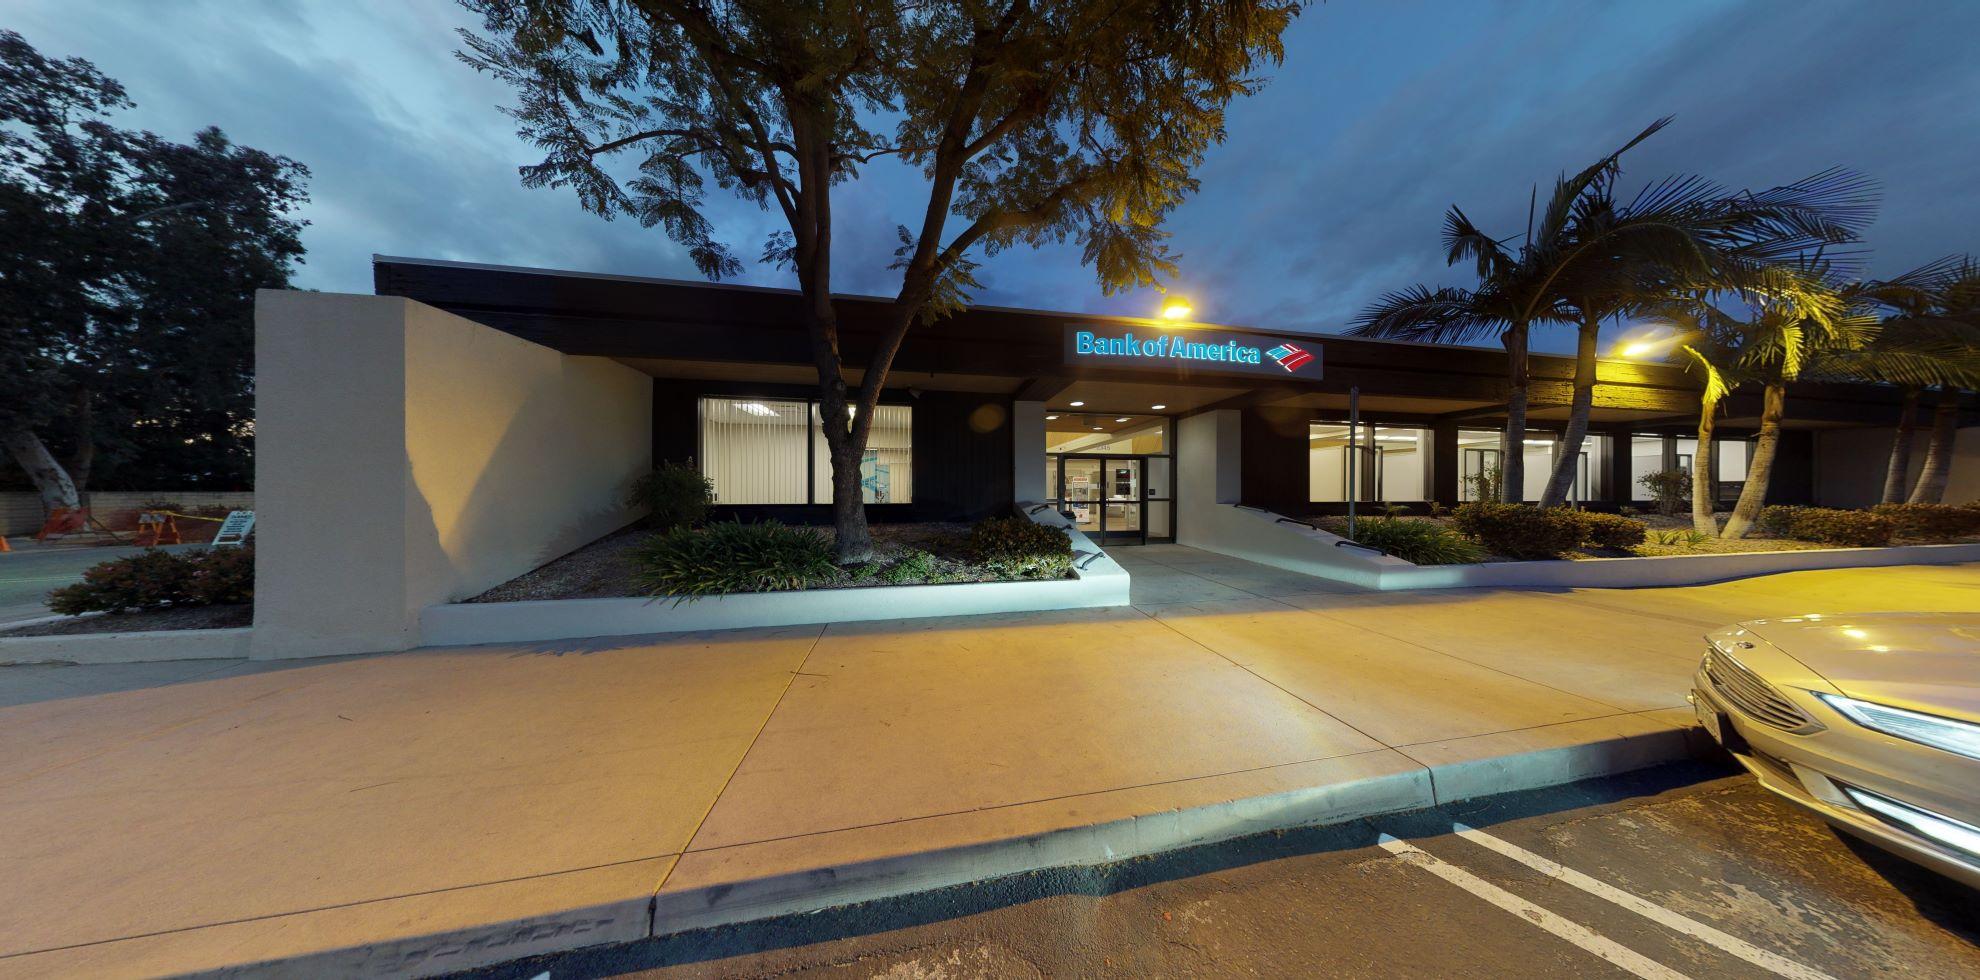 Bank of America financial center with drive-thru ATM | 2345 Borchard Rd, Newbury Park, CA 91320